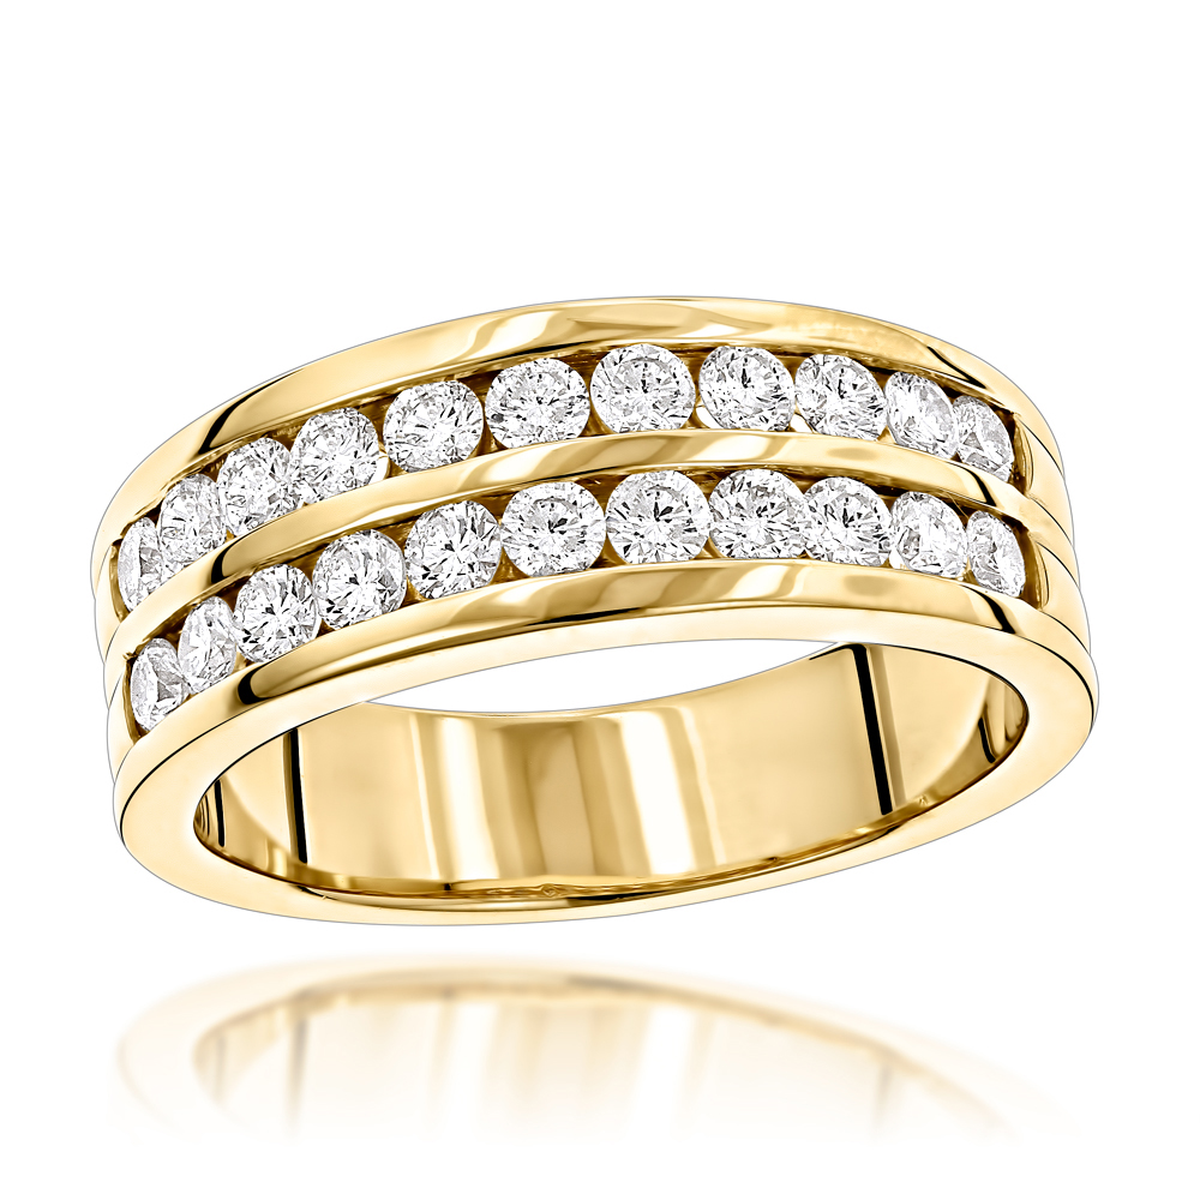 14K Gold Mens Diamond Wedding Ring w 1.5ct of Round Diamonds by Luxurman